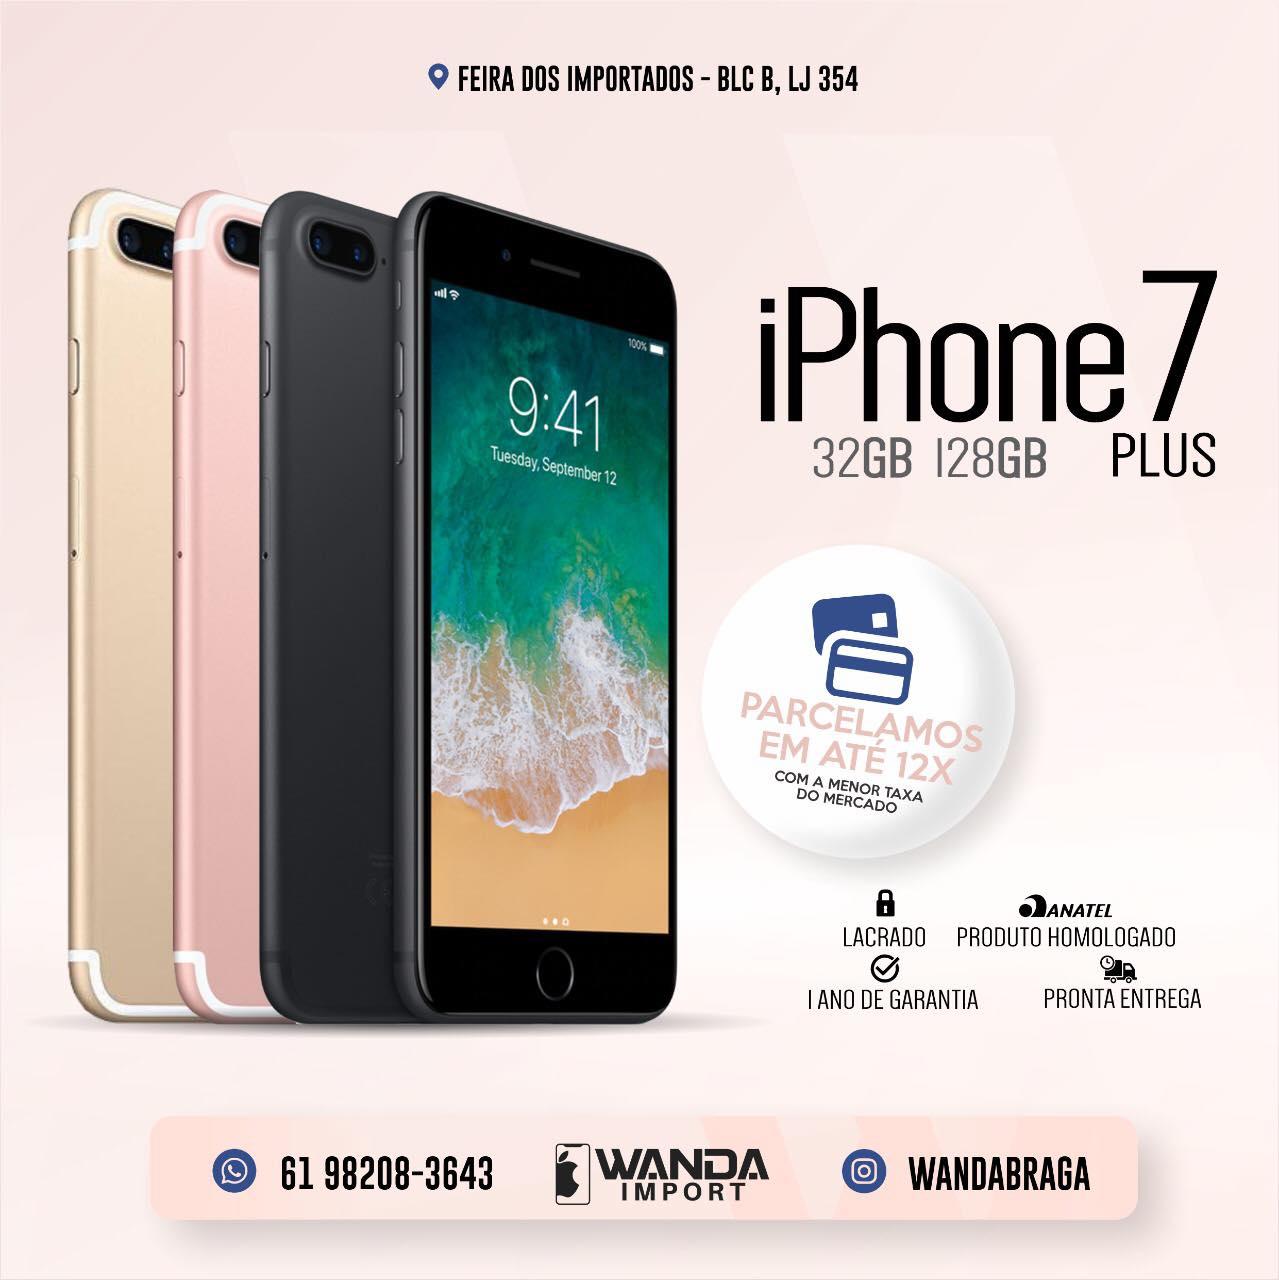 d6fa06fc0 iPhone 7 - Feira dos Importados de Brasília - Sia - A Loja Virtual